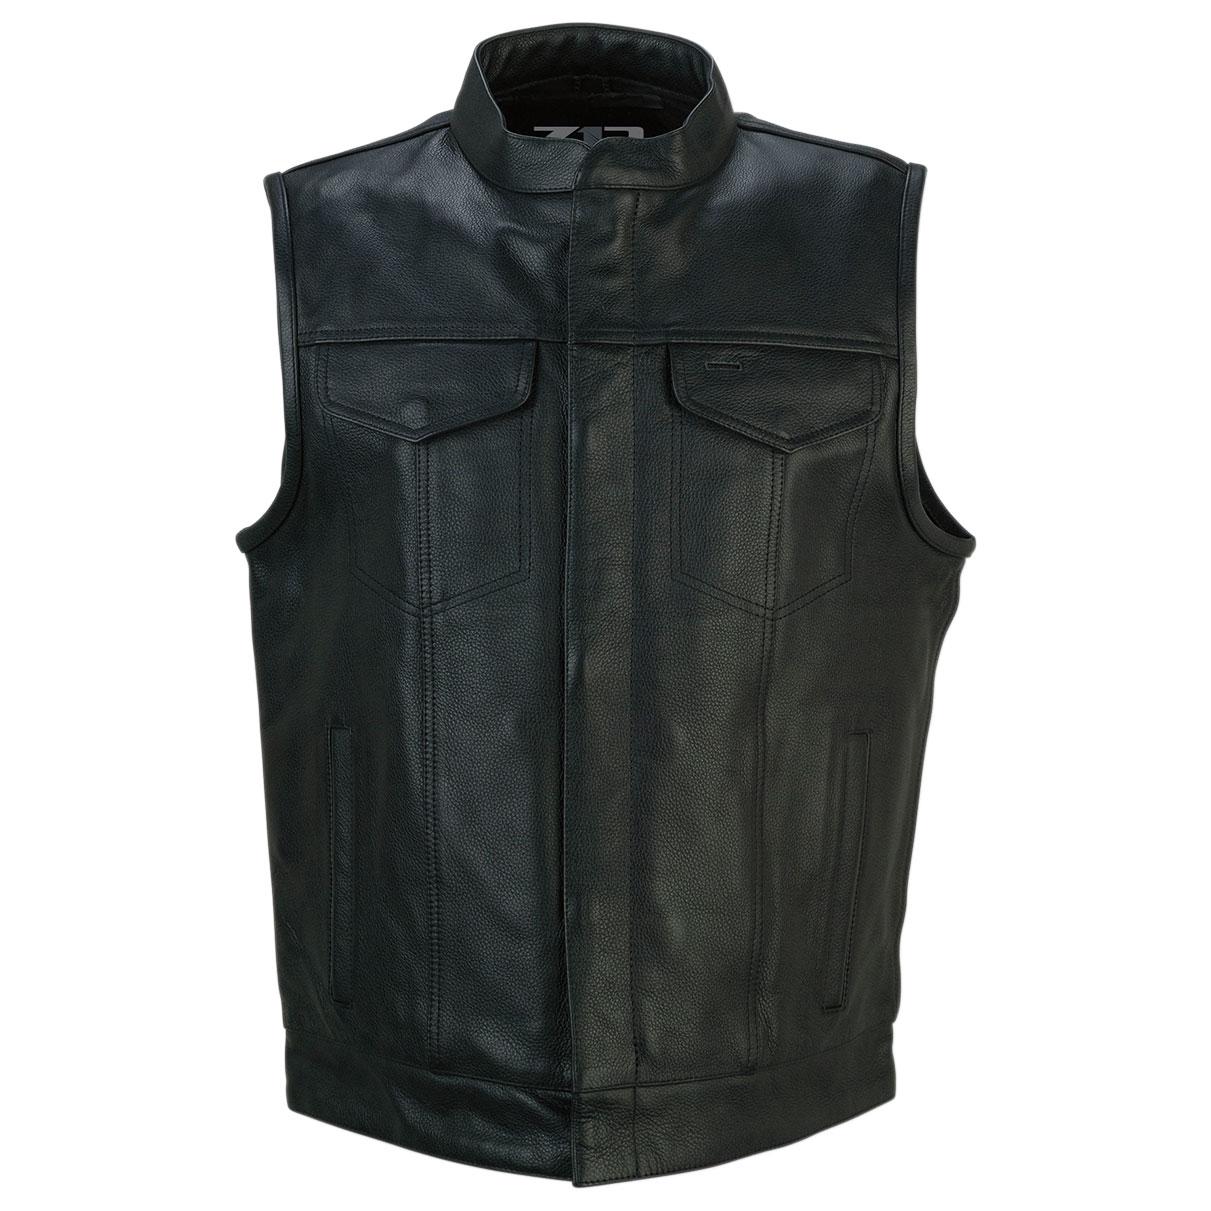 Z1R Men's Vindicator Black Leather Vest